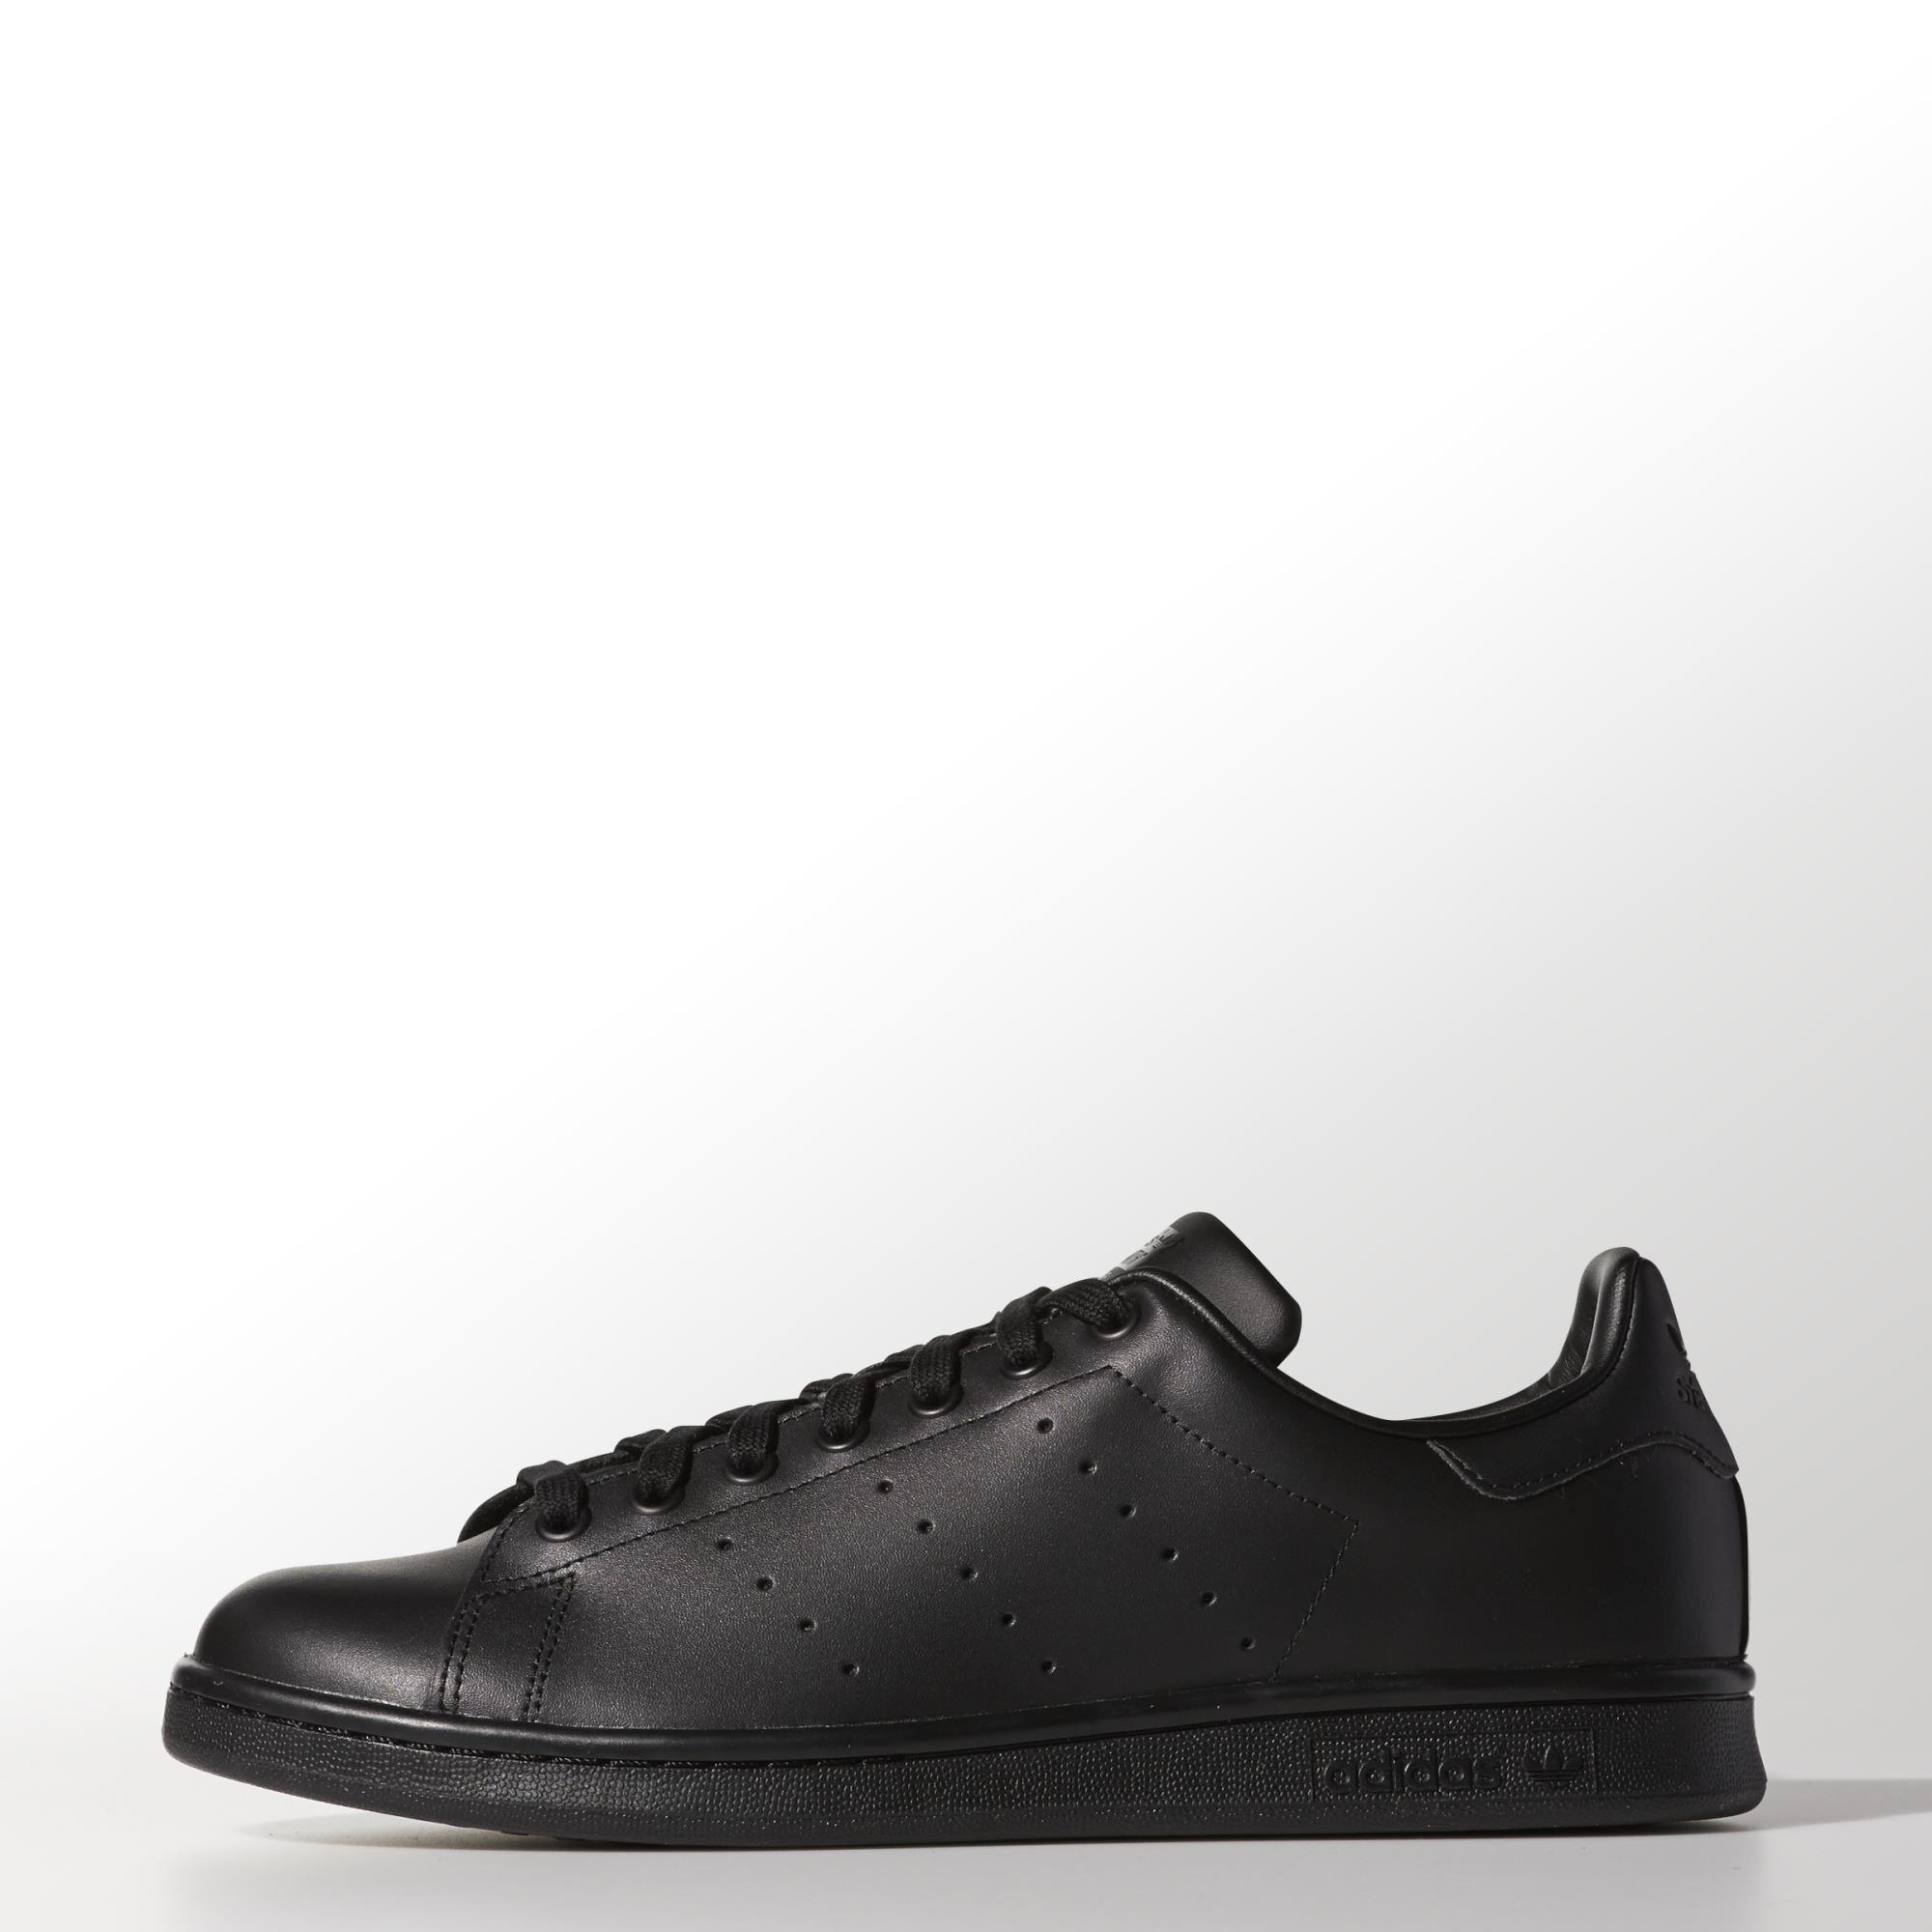 dda7a2ce31 Stan Smith Shoes | Caleb Fashion God | Stan smith shoes, Adidas stan ...